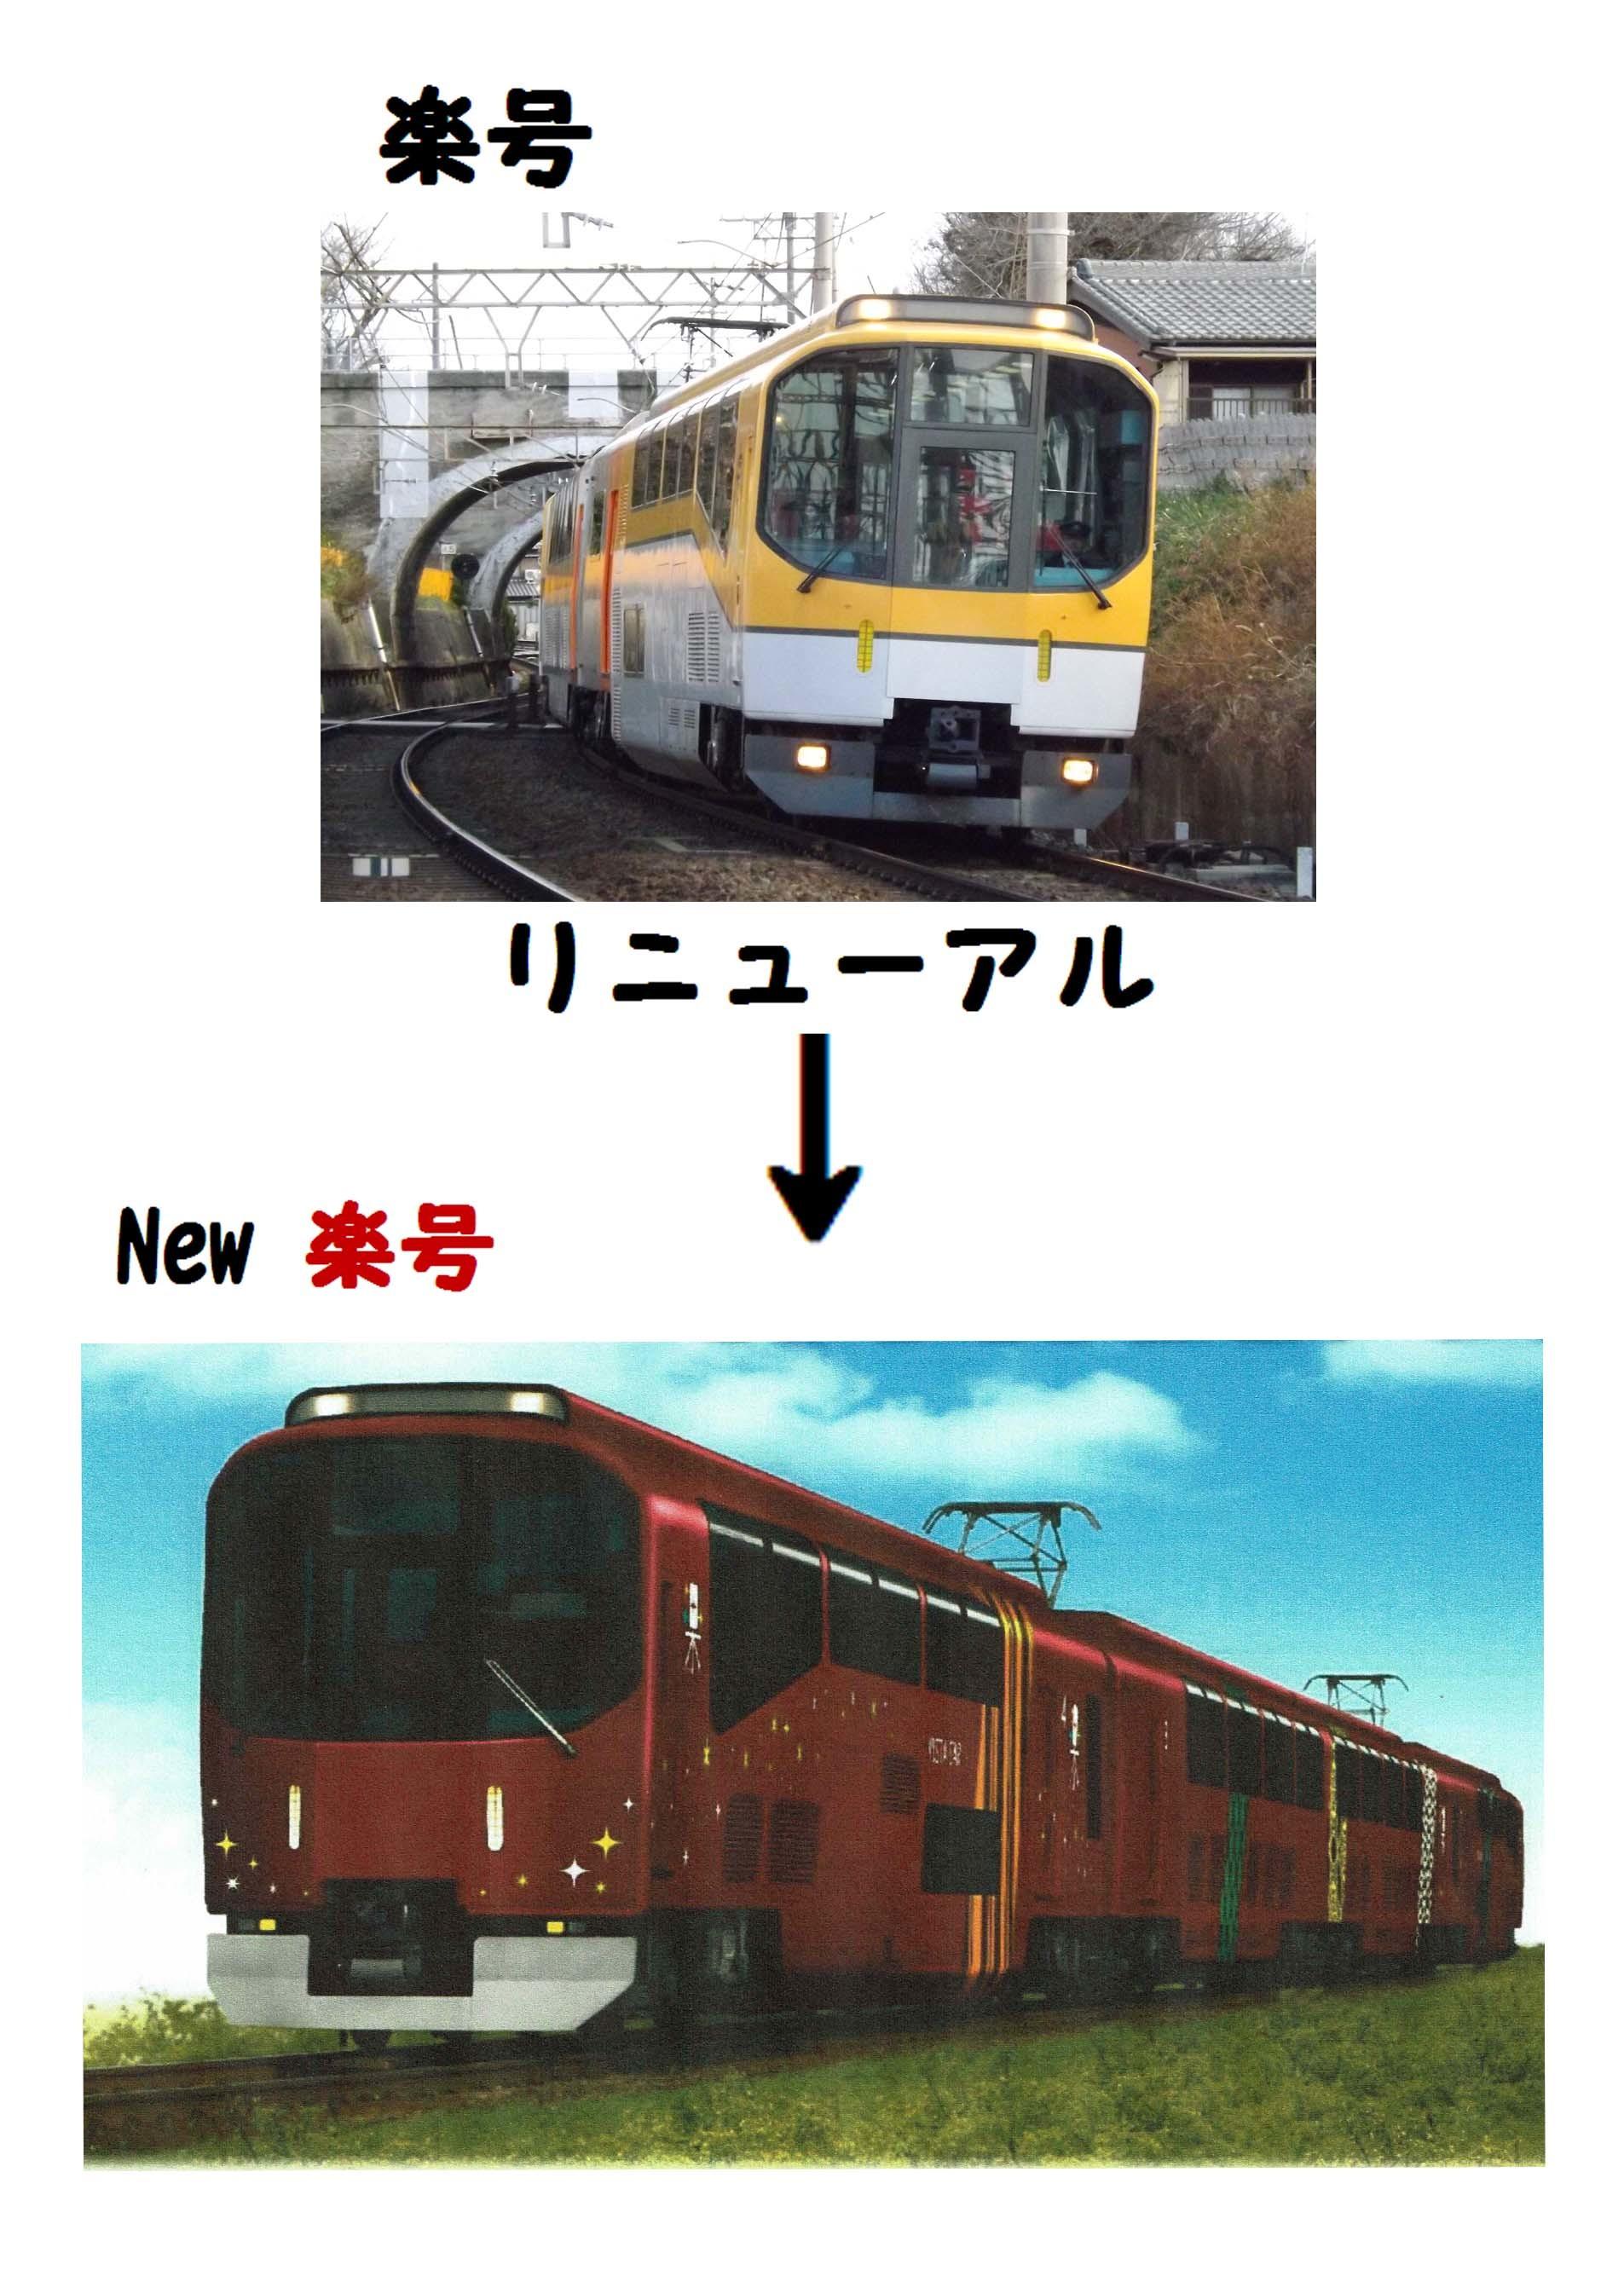 『vol.4103 近鉄団体専用列車・楽がリ二ューアル』_e0040714_15374139.jpg